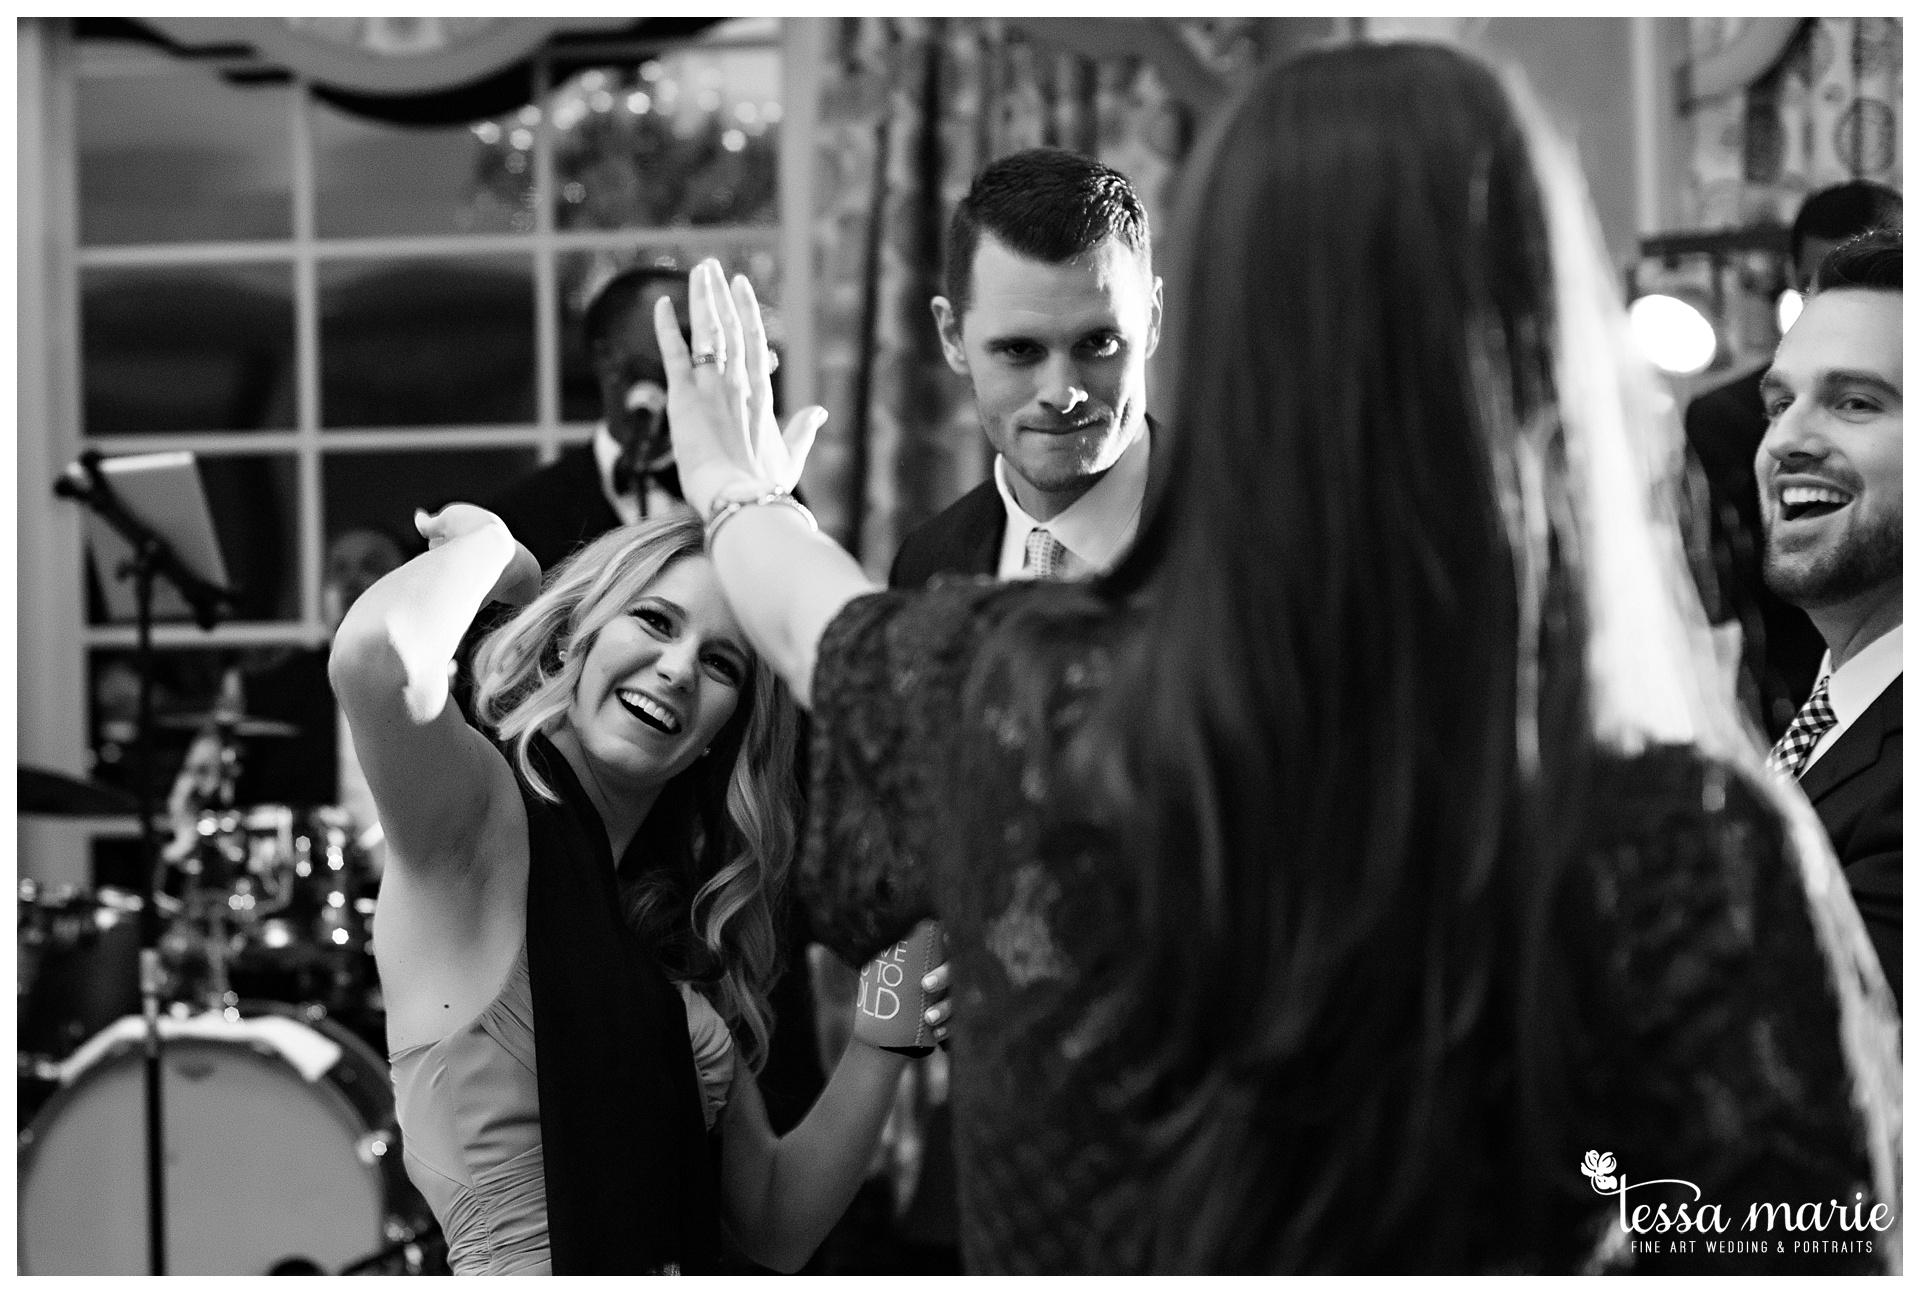 tessa_marie_weddings_legacy_story_focused_wedding_pictures_atlanta_wedding_photographer_0154